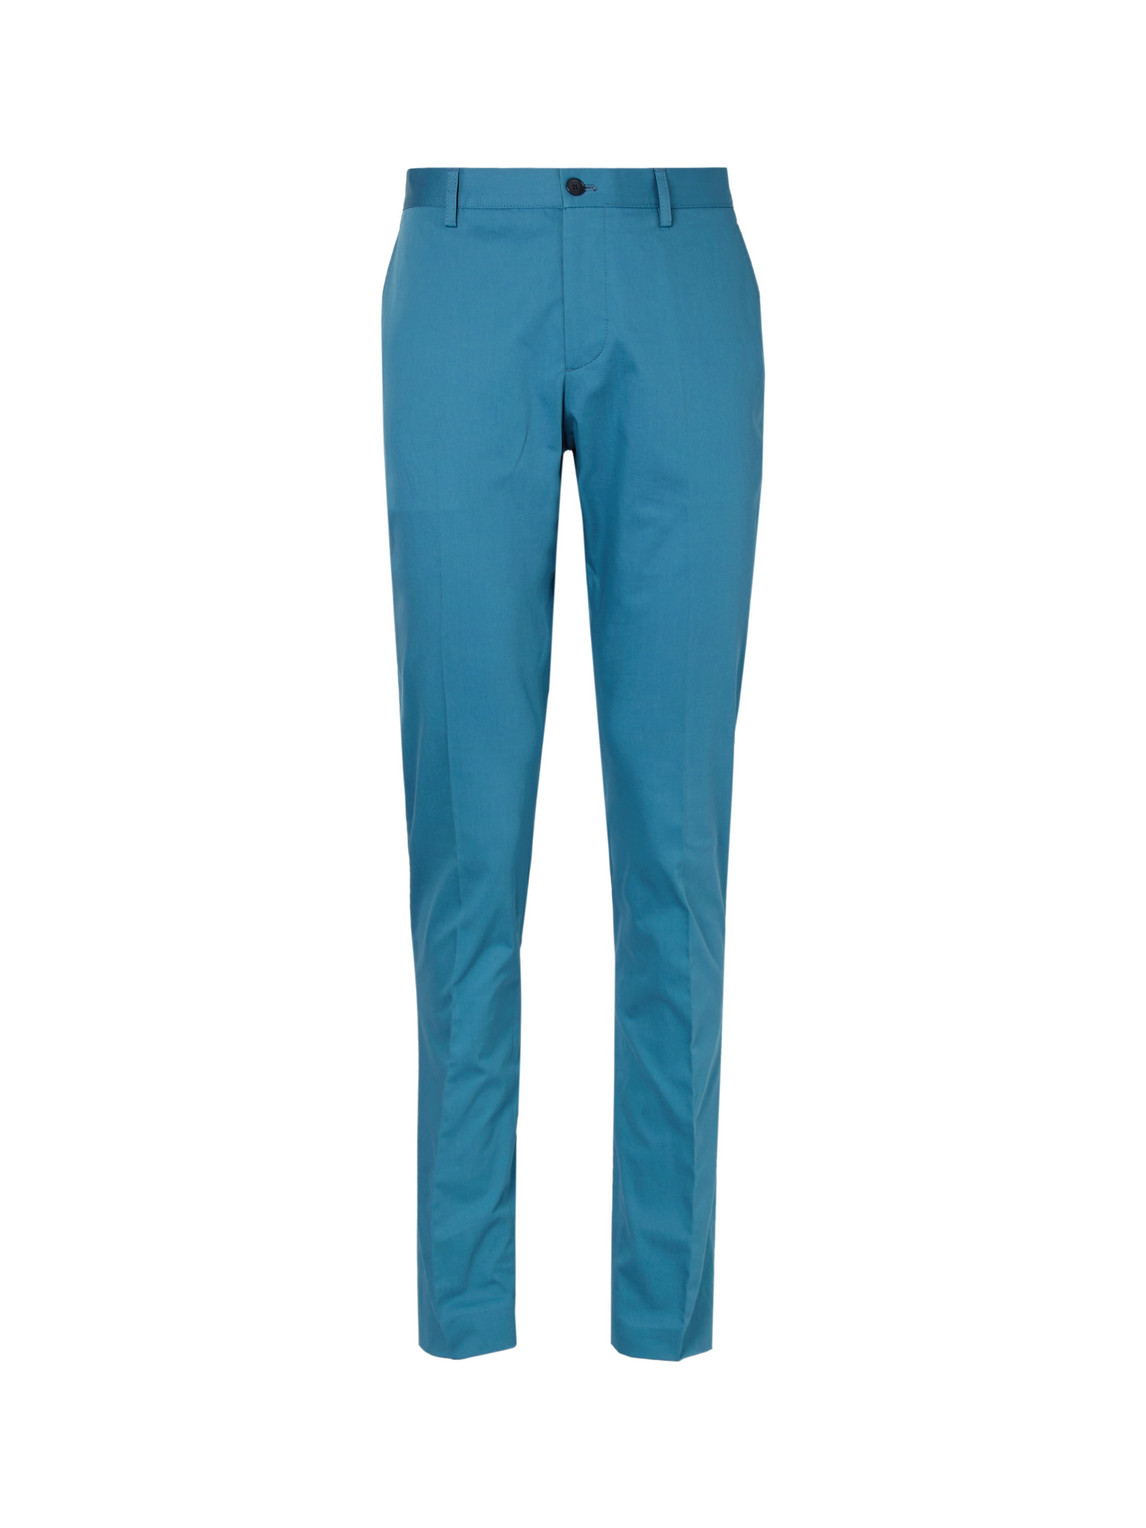 etro - stretch-cotton twill trousers - men - blue - it 52